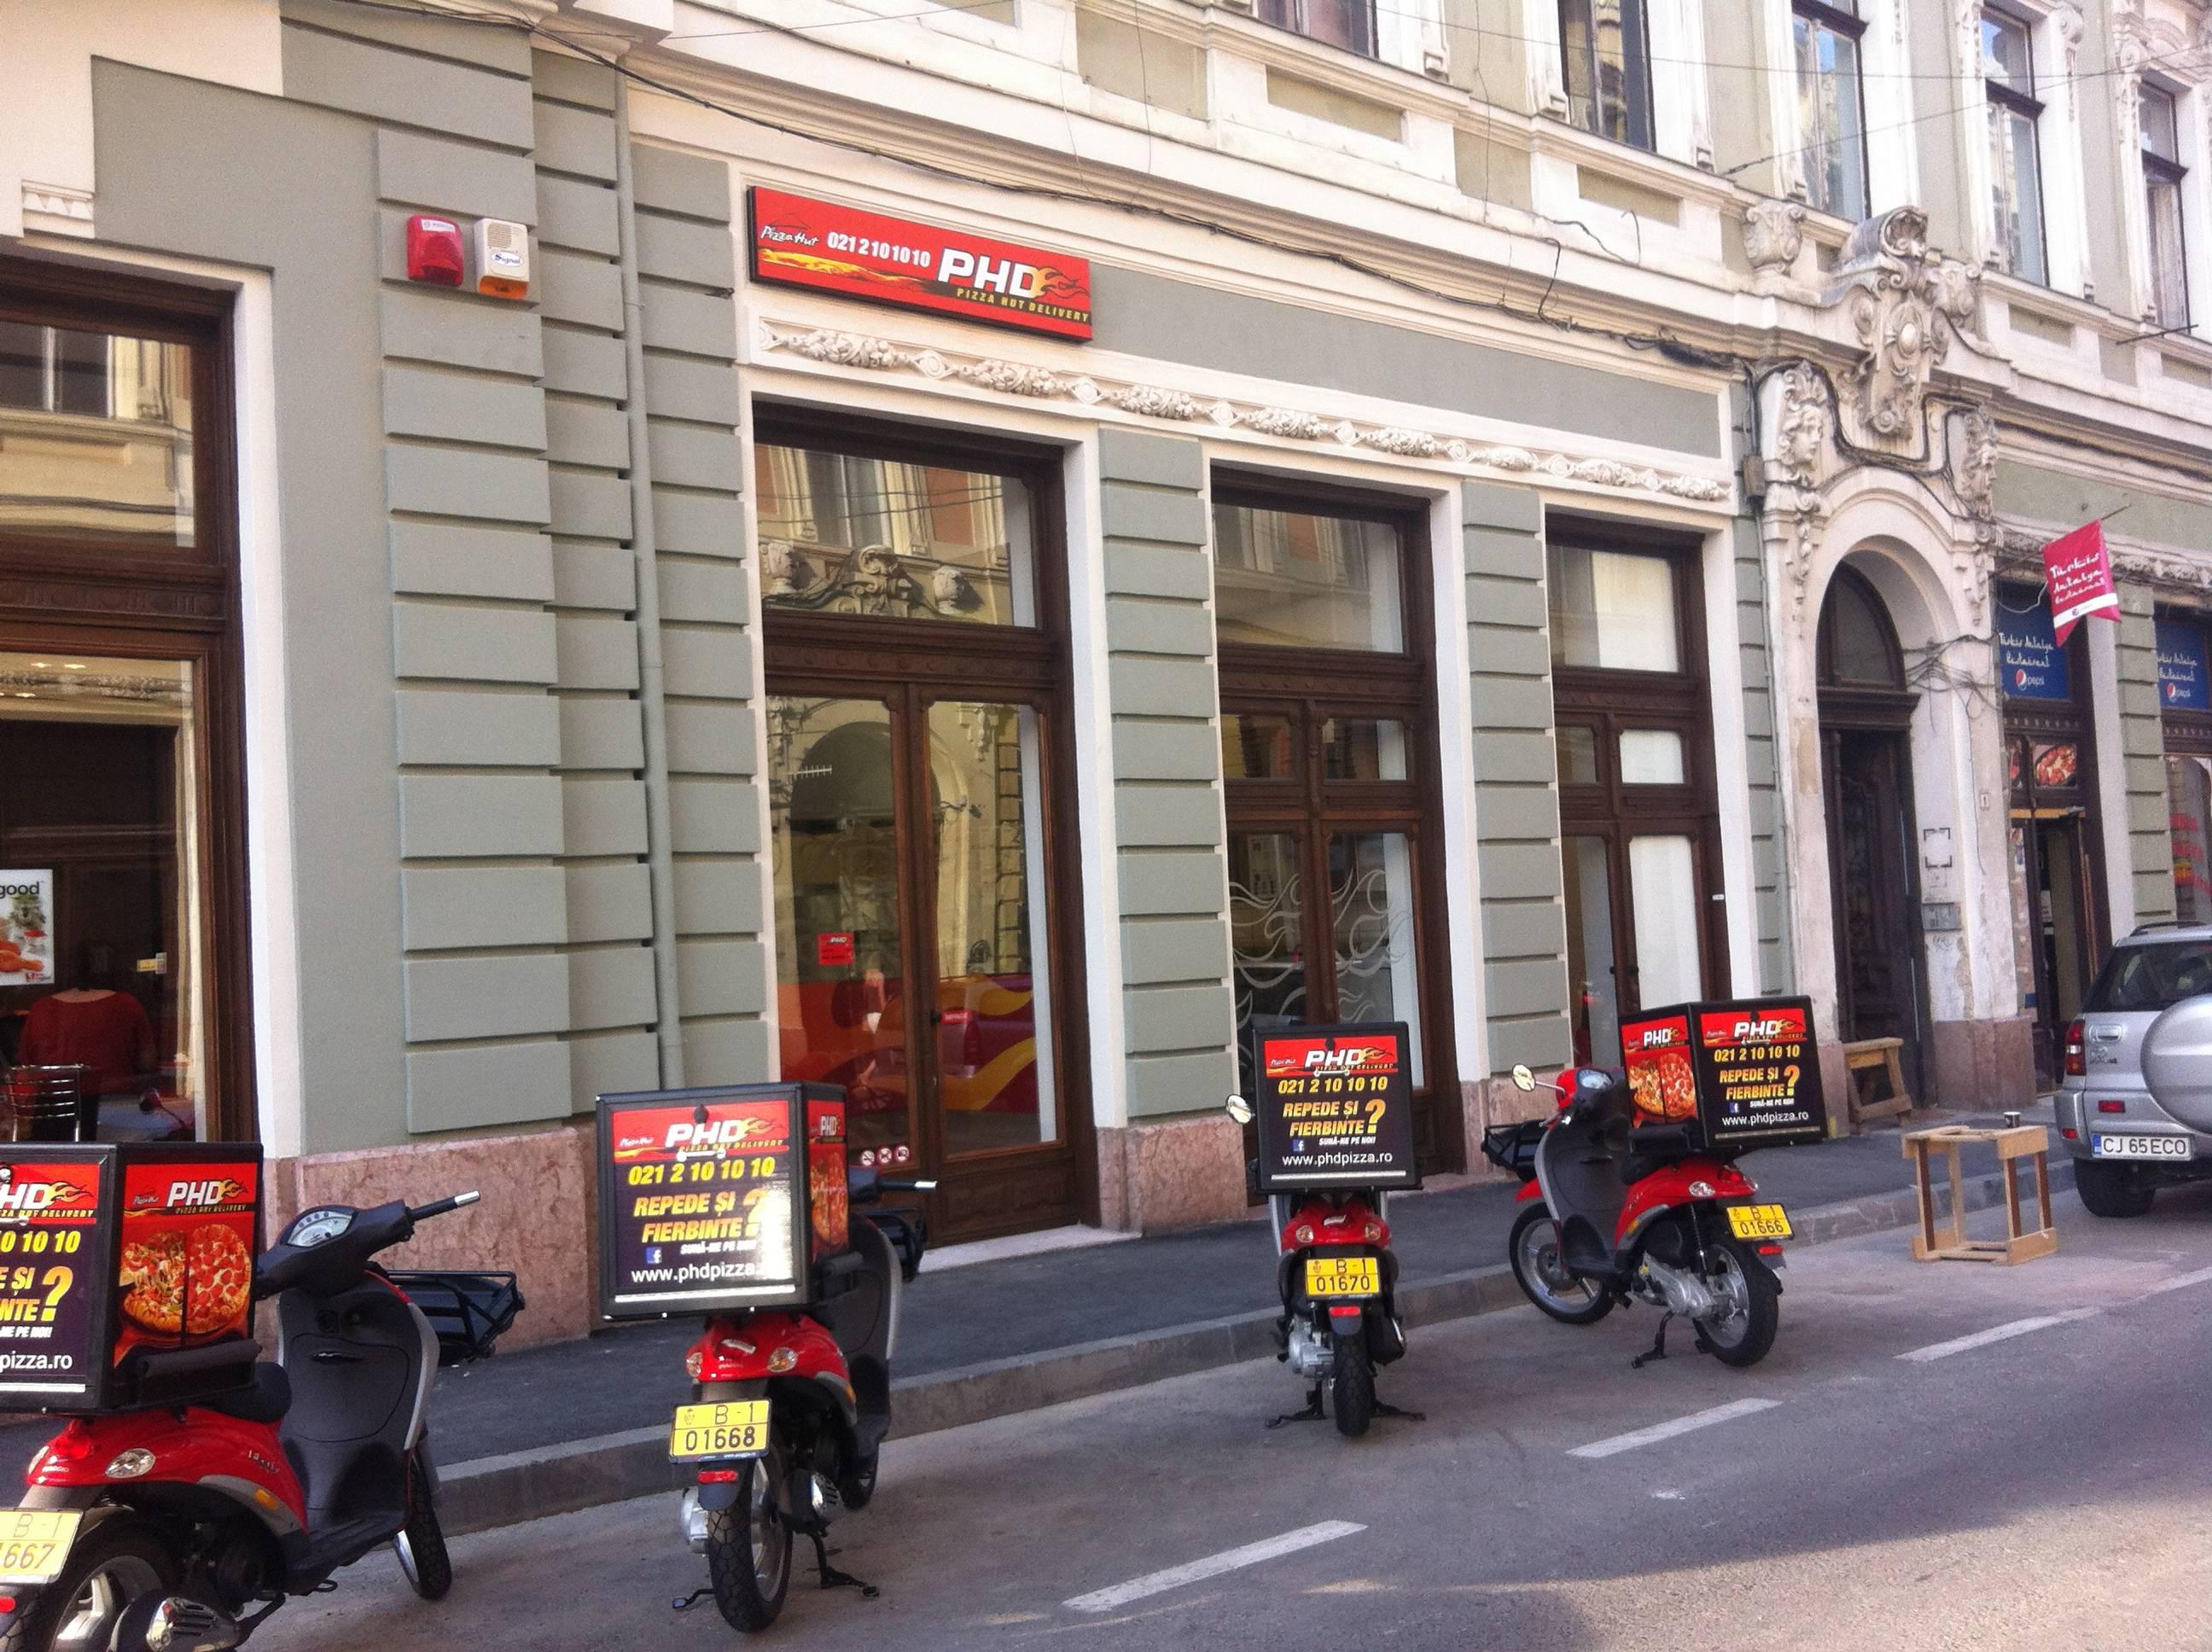 Pizza Hut Delivery a deschis a doua unitate din provincie la Cluj!